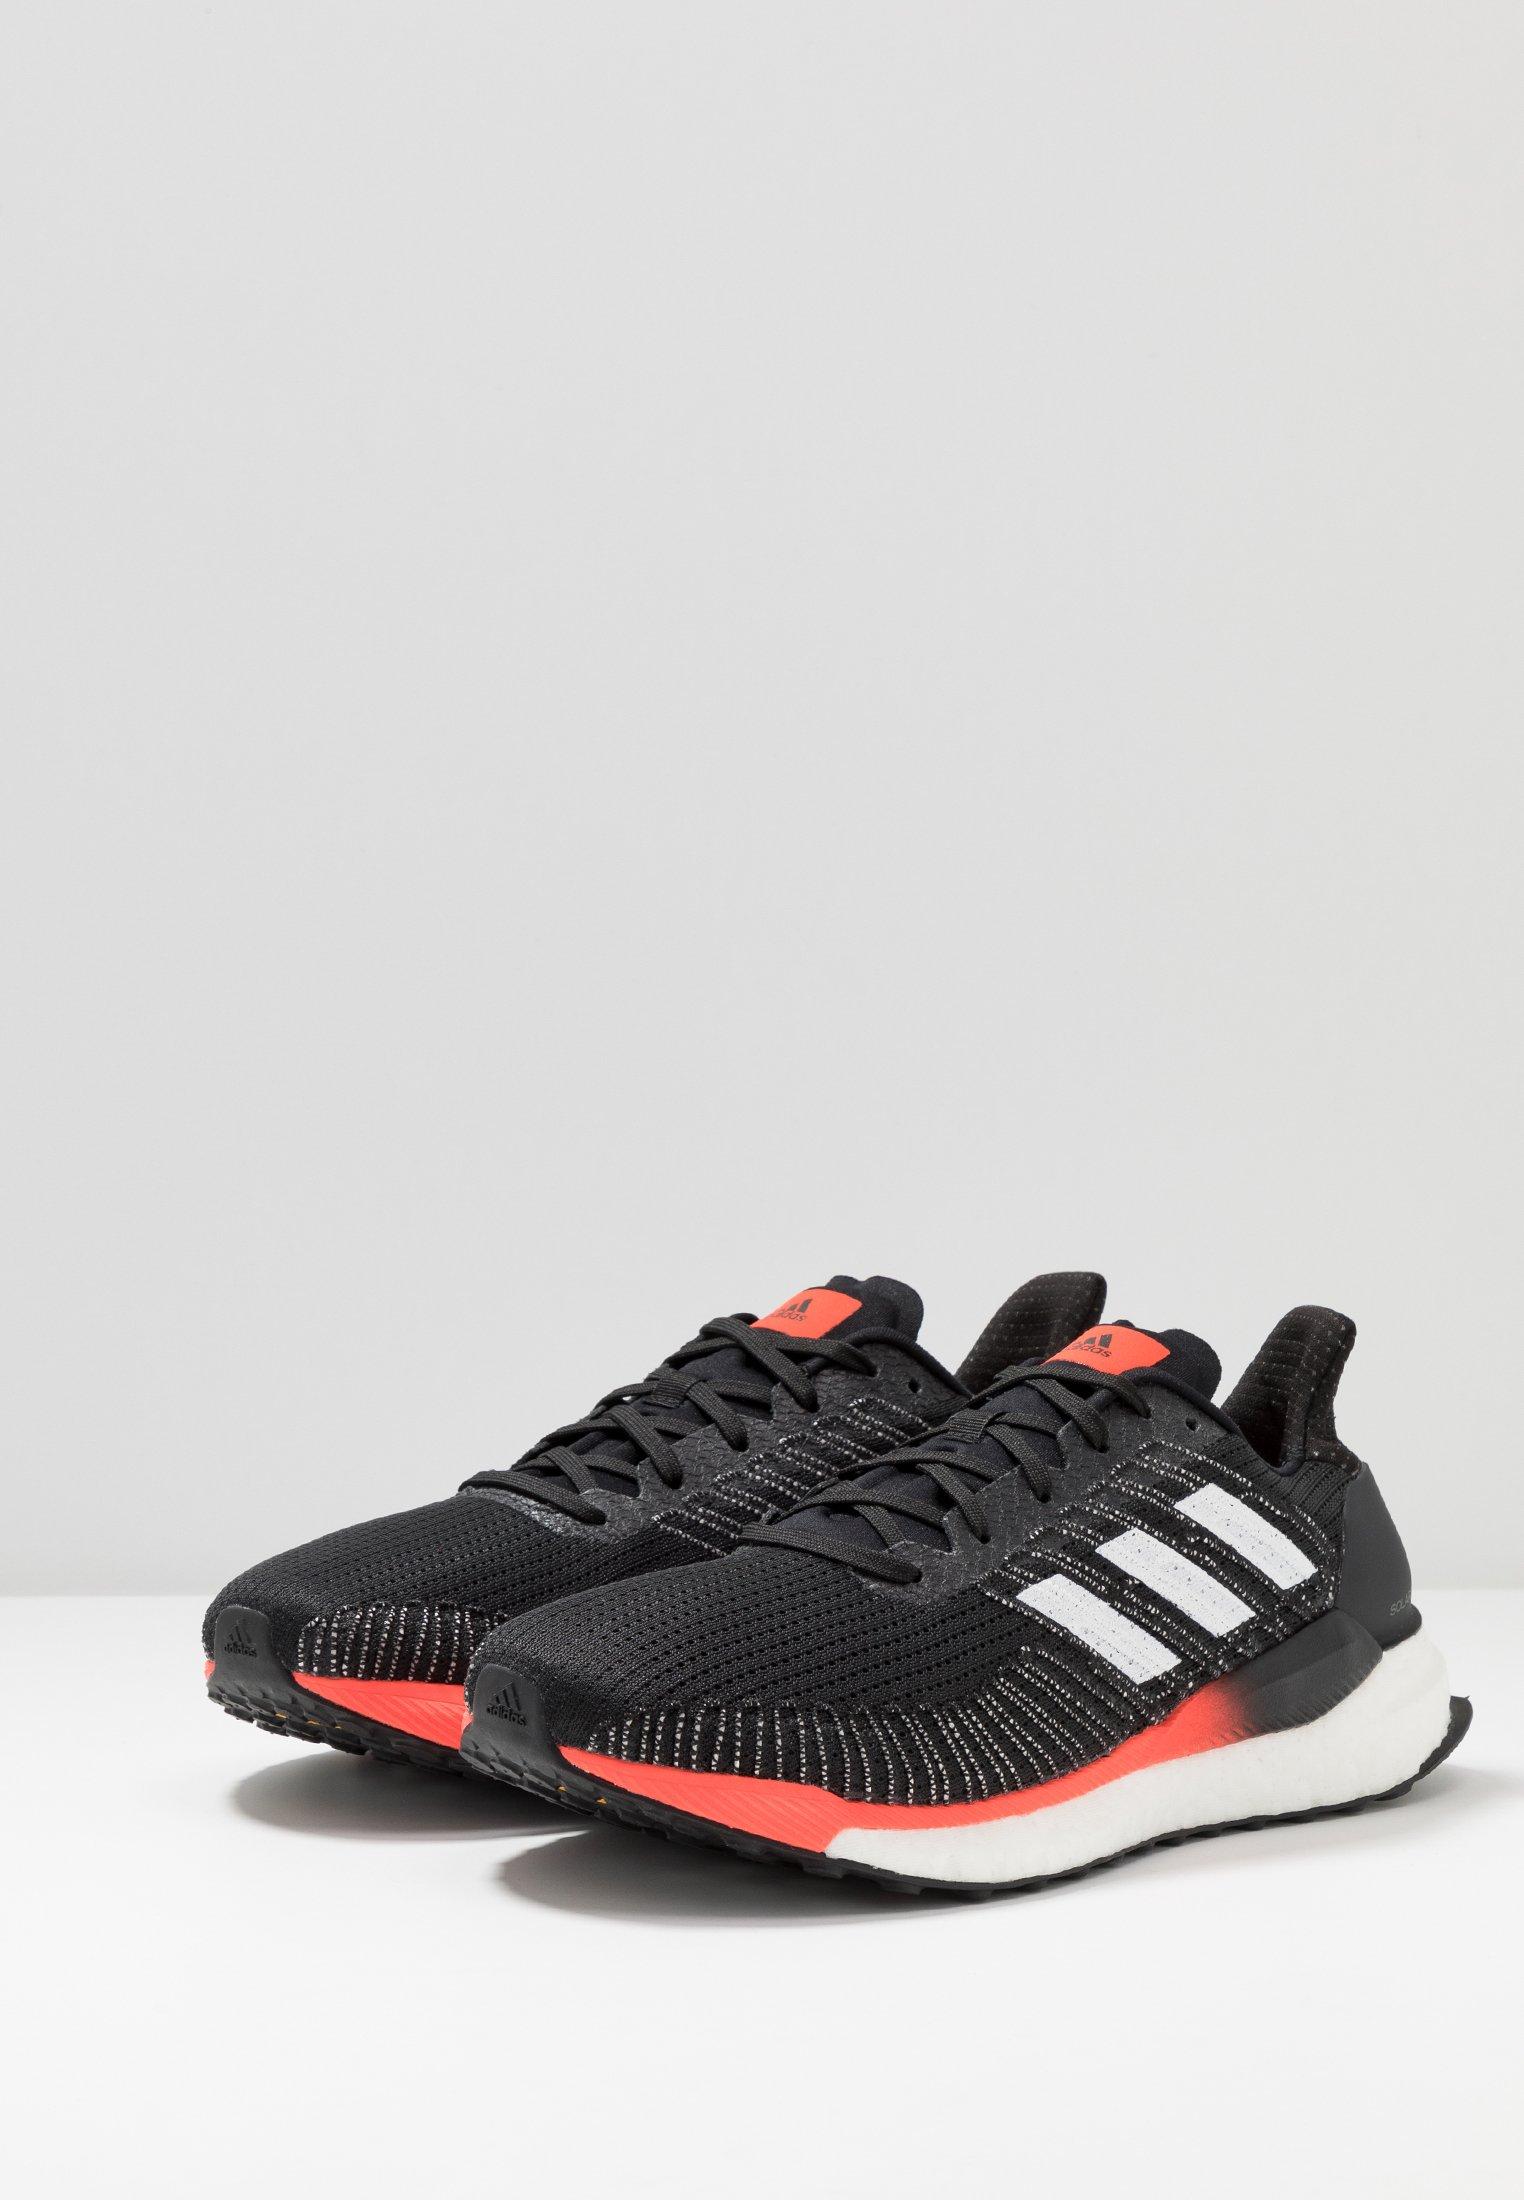 Adidas Performance Solar Boost 19 - Laufschuh Neutral Core Black/footwear White/solar Red Black Friday